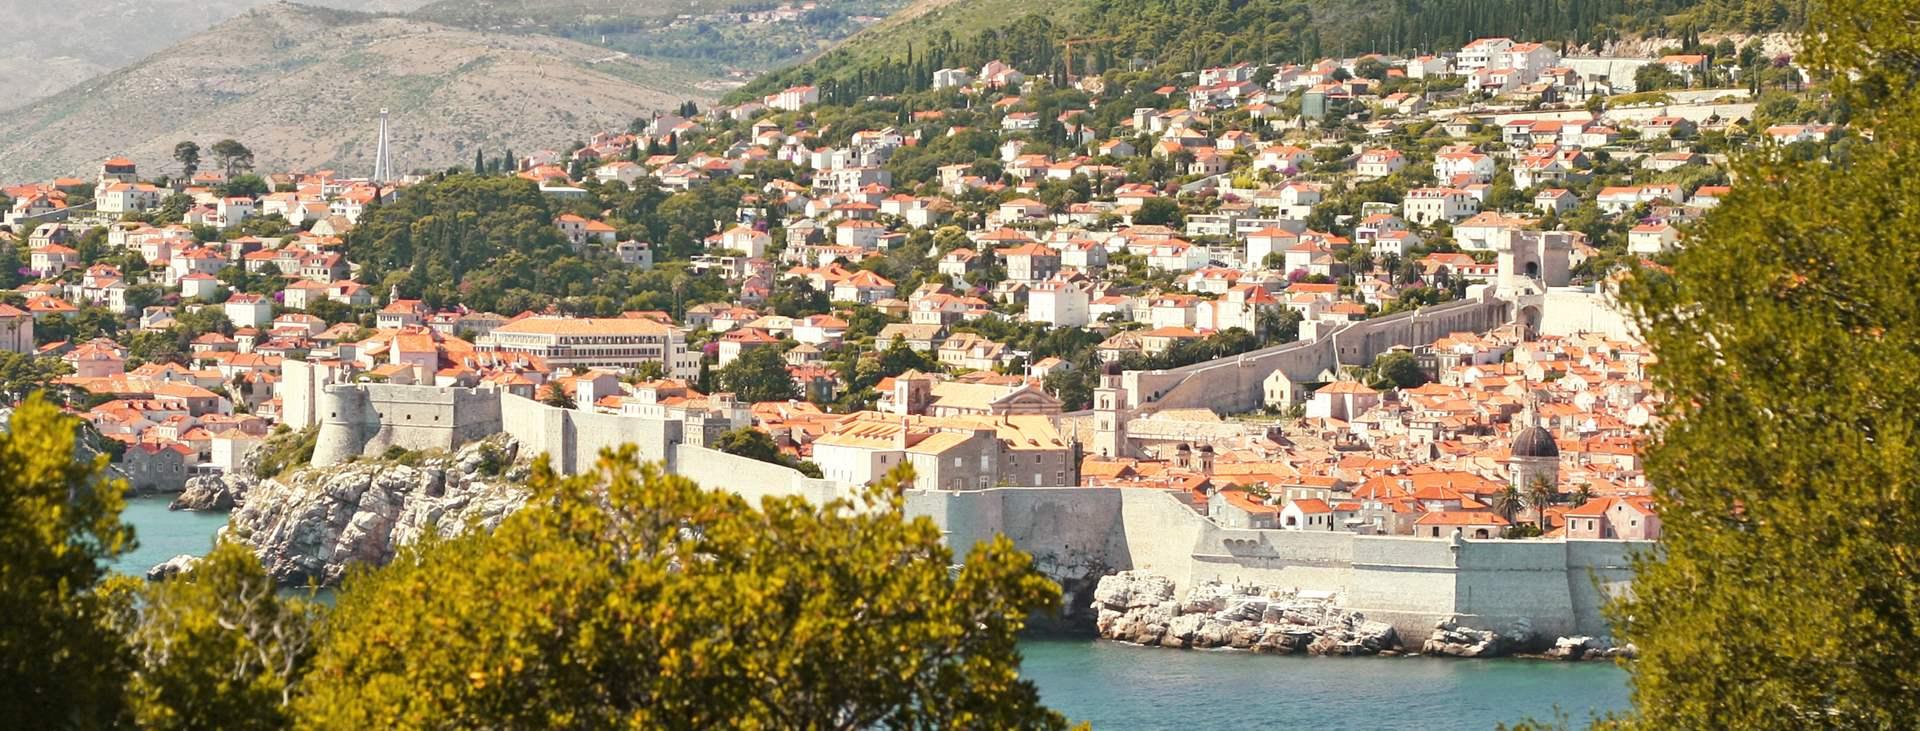 Boka din resa till Dubrovnik i Kroatien med Ving